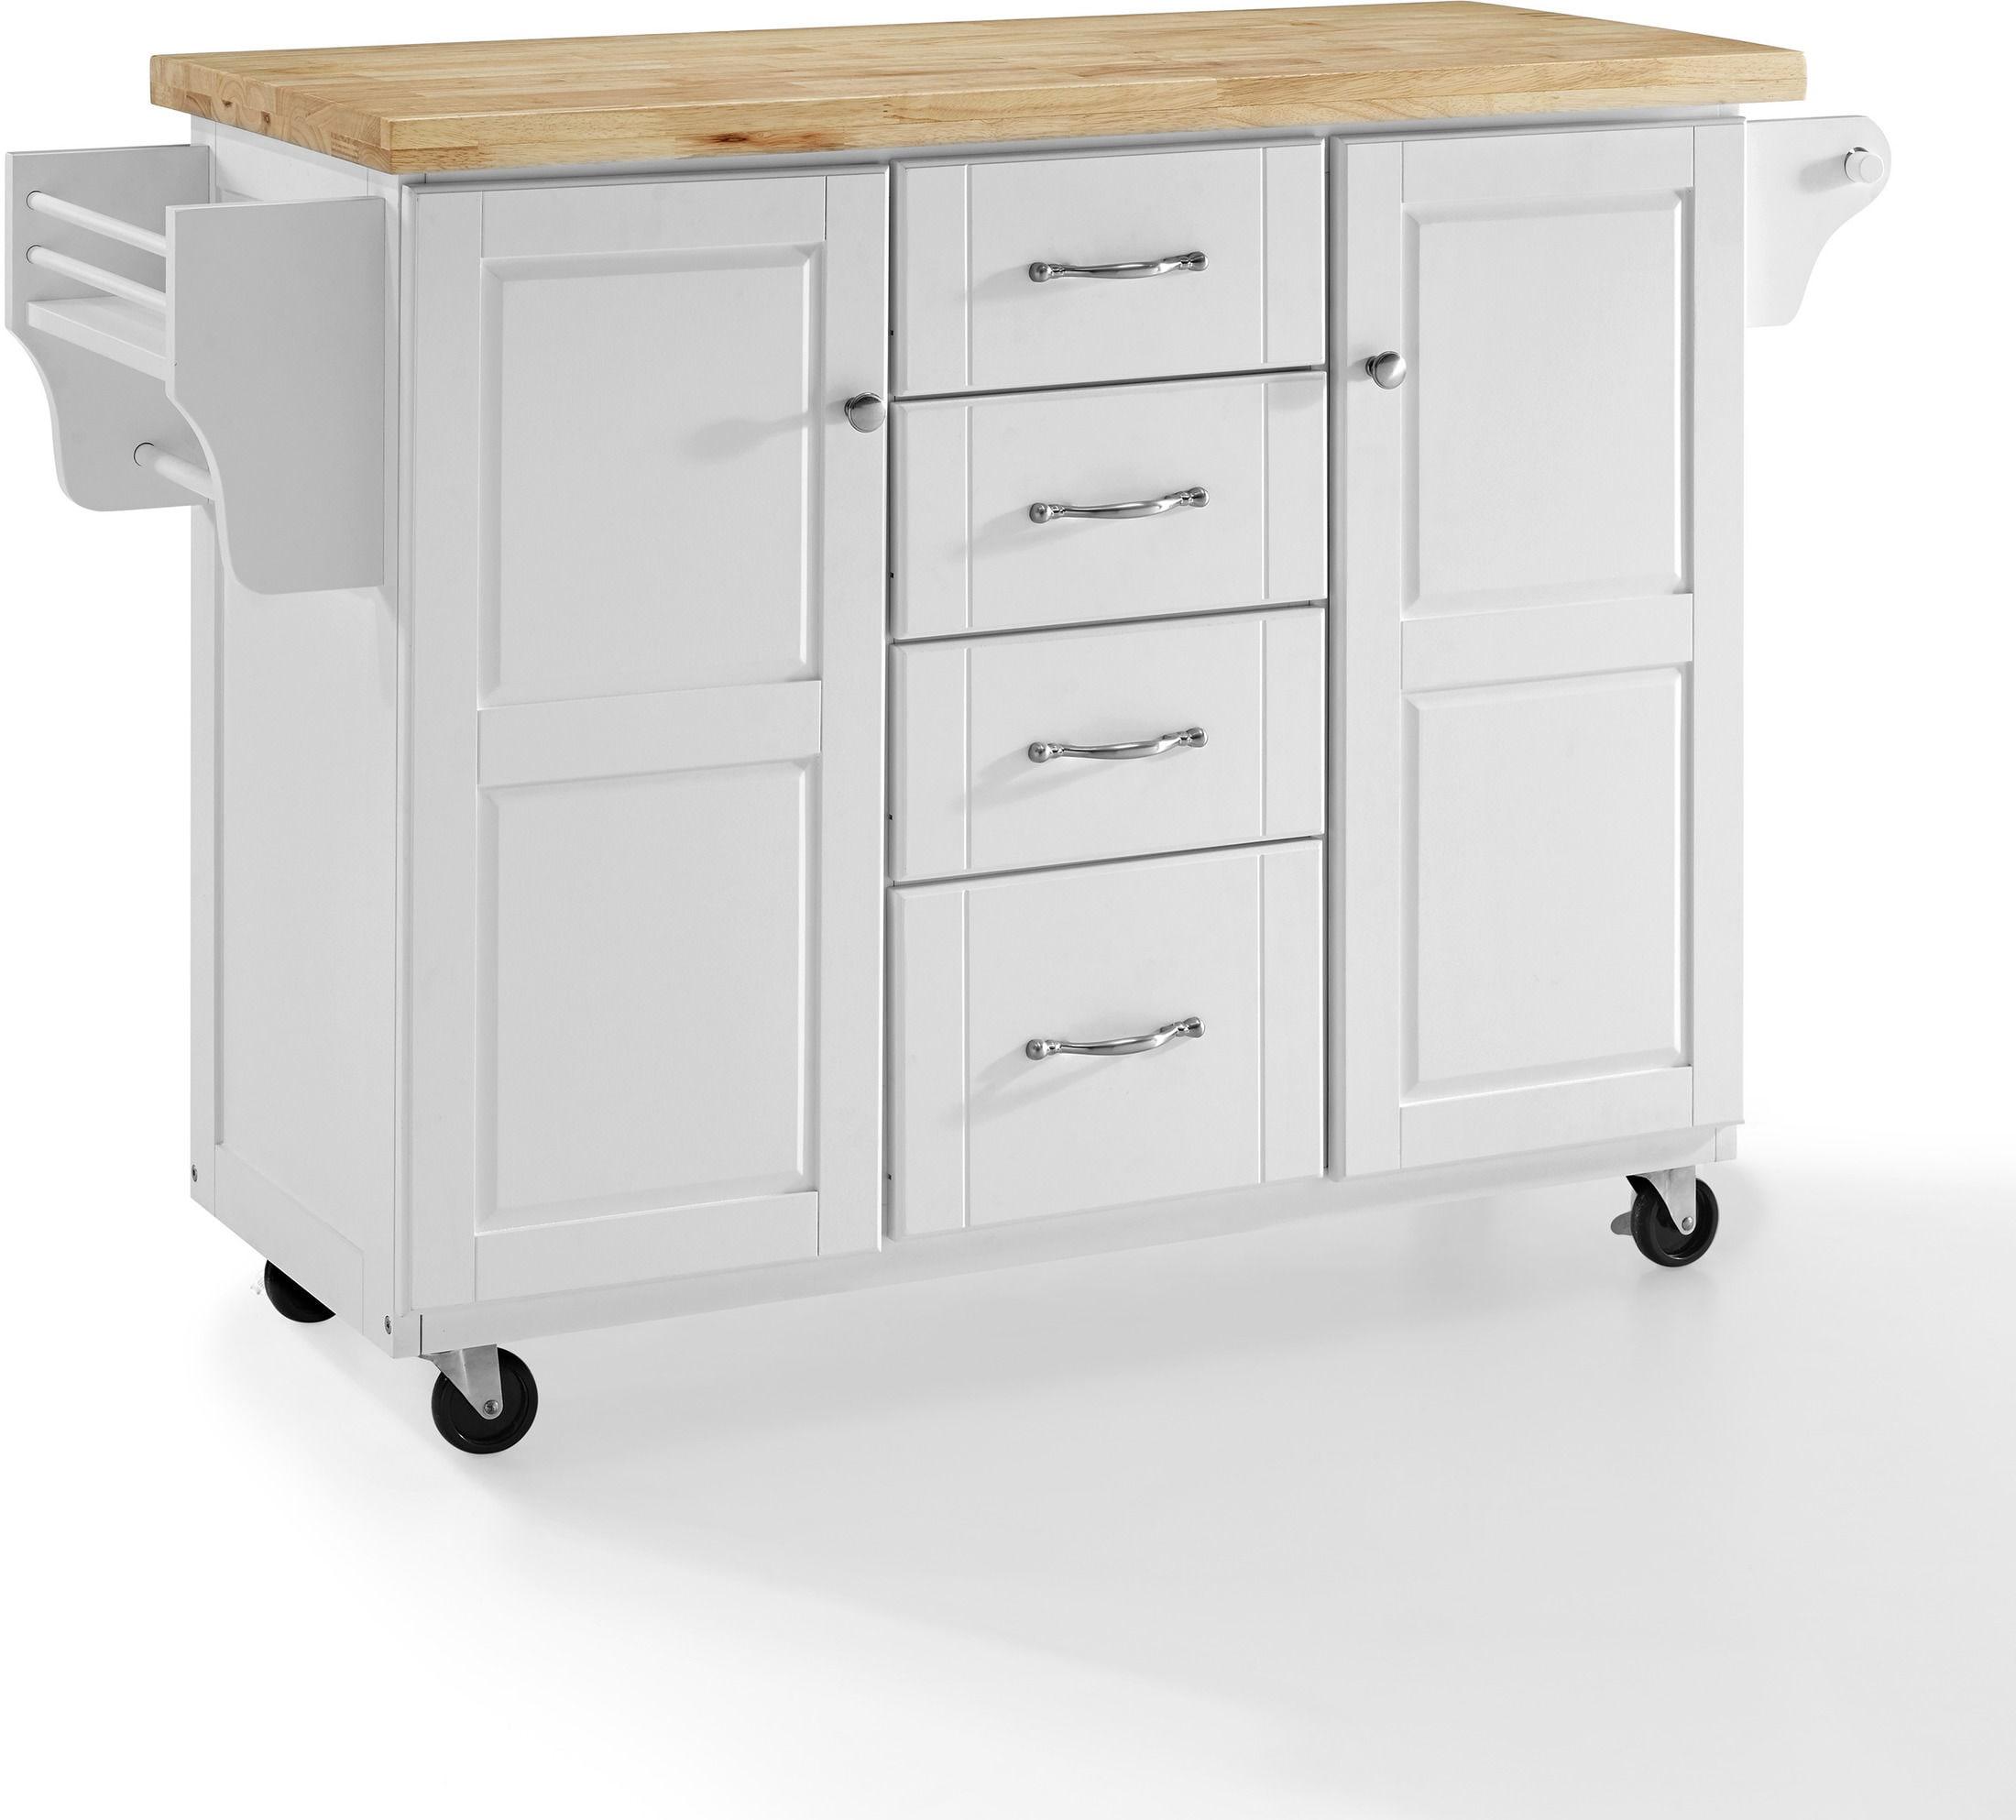 Dining Room Furniture - Jake Kitchen Cart